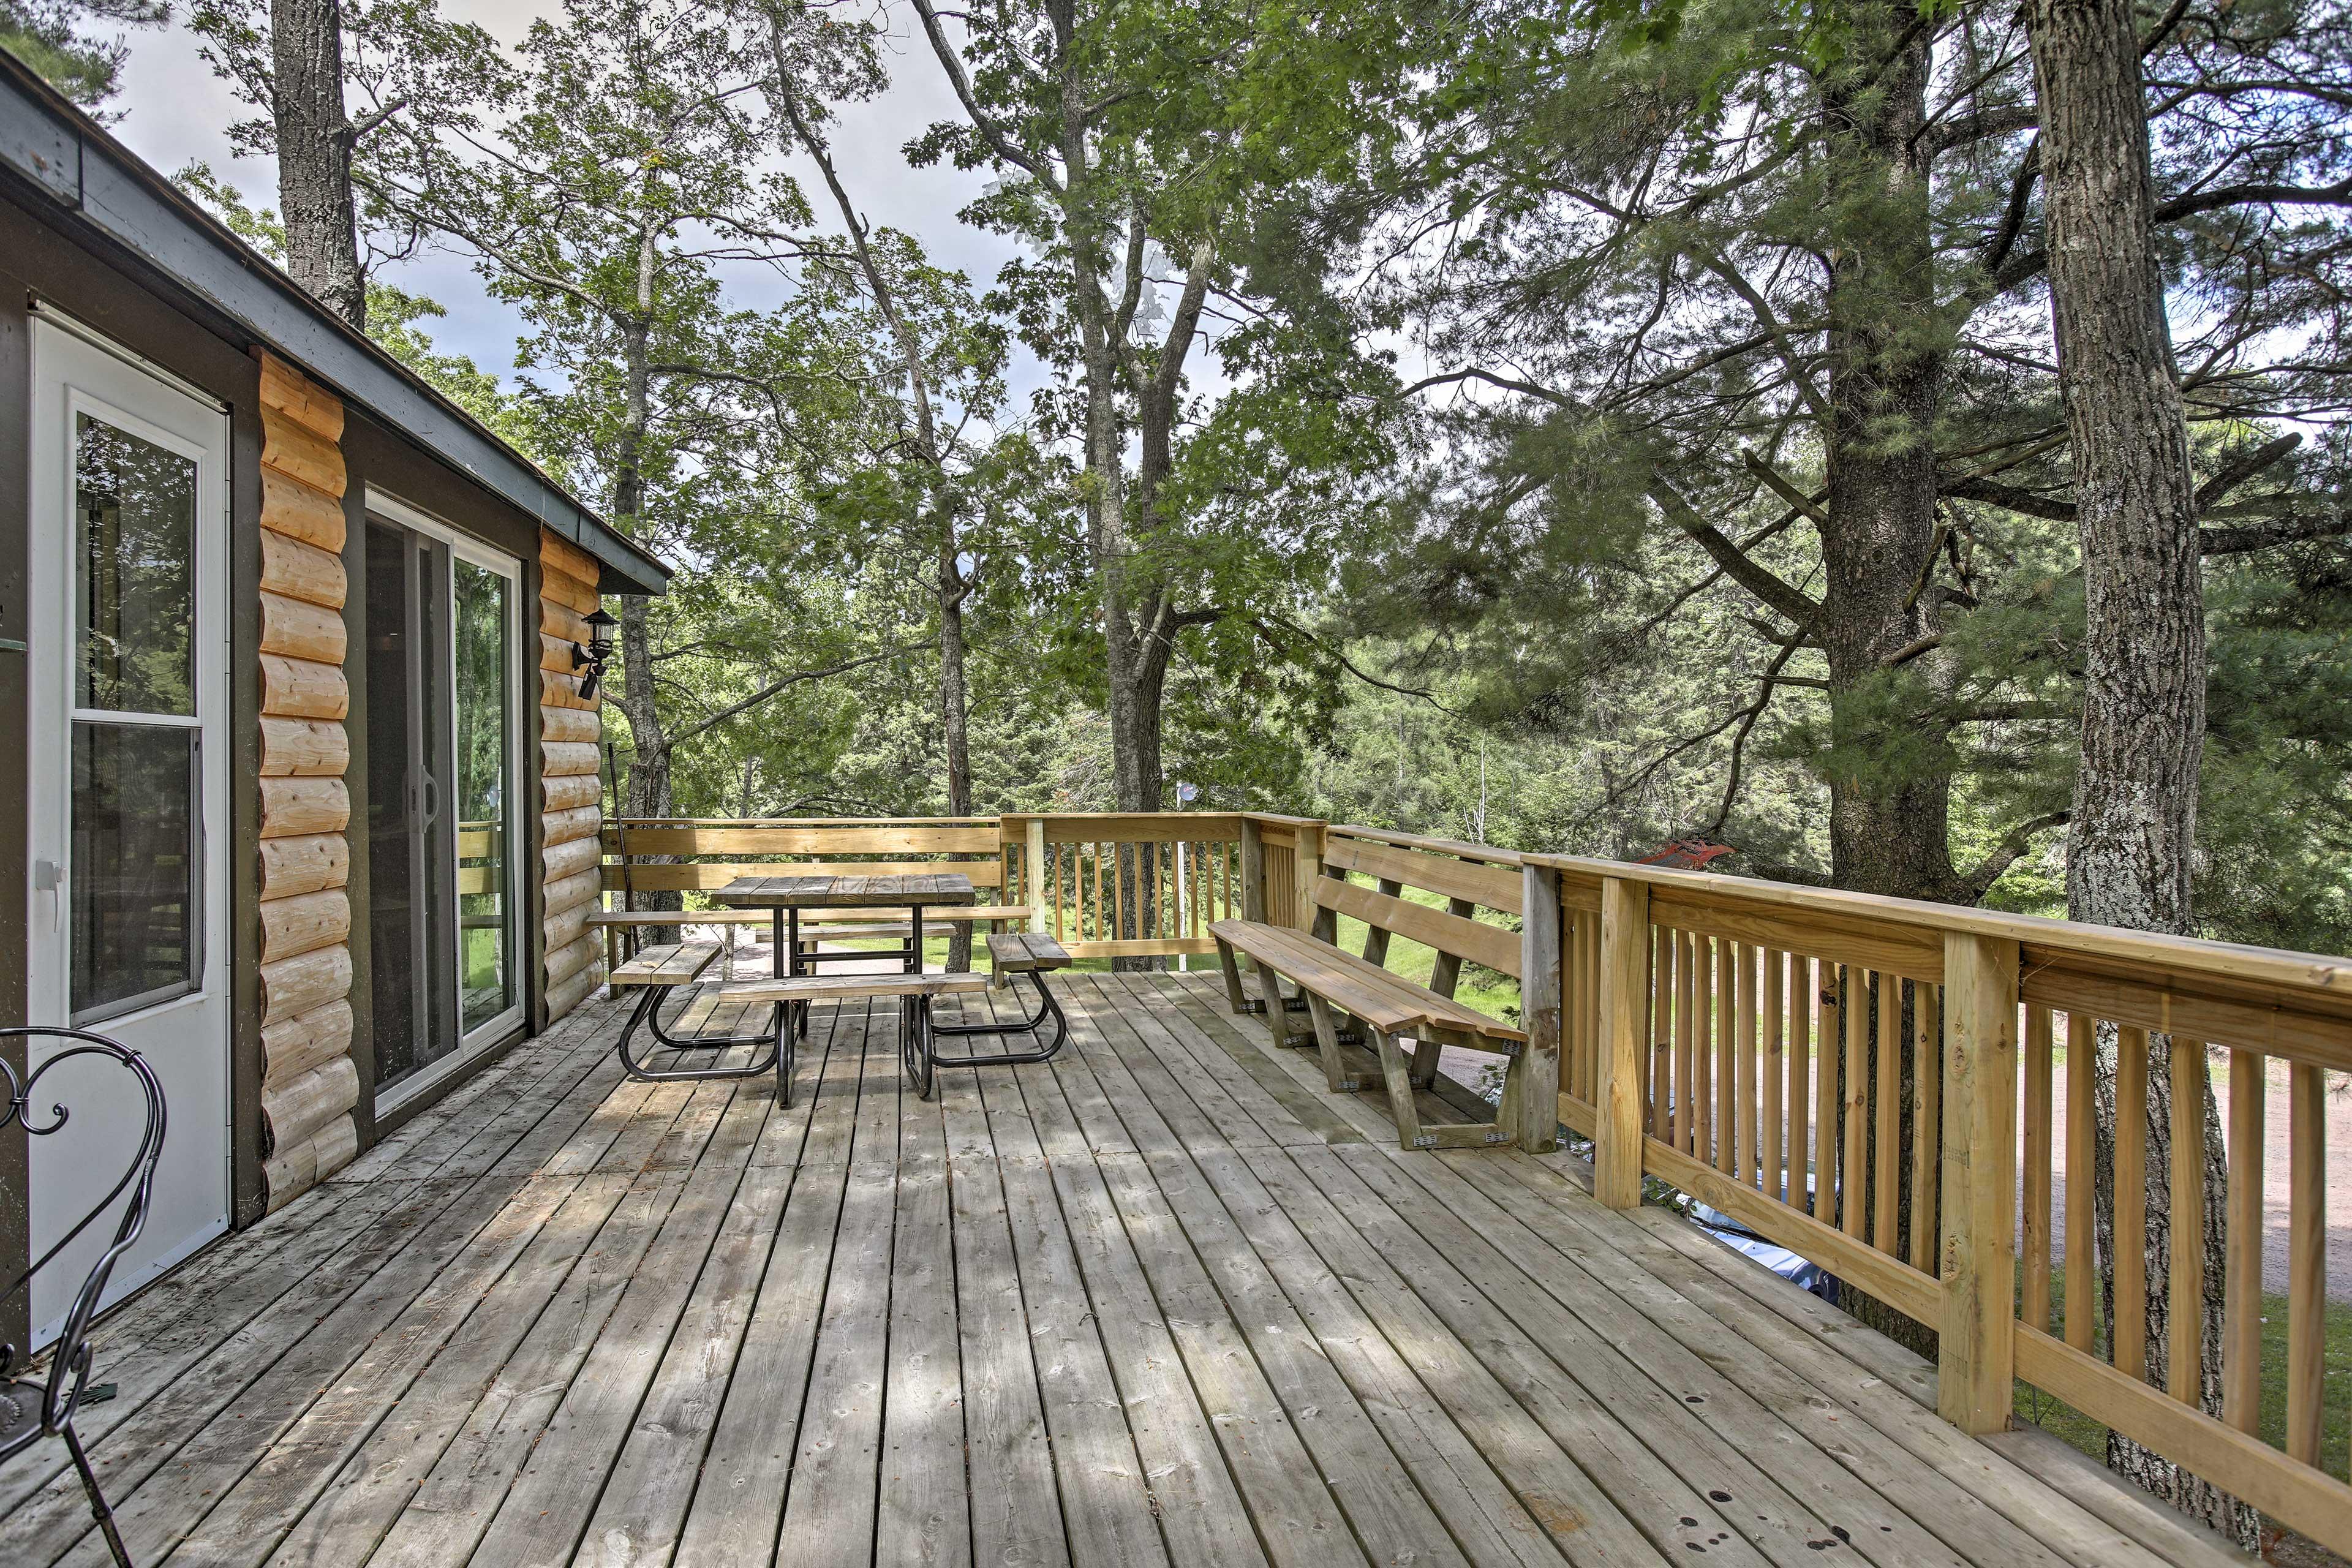 Cabin Exterior | On Grindstone Lake